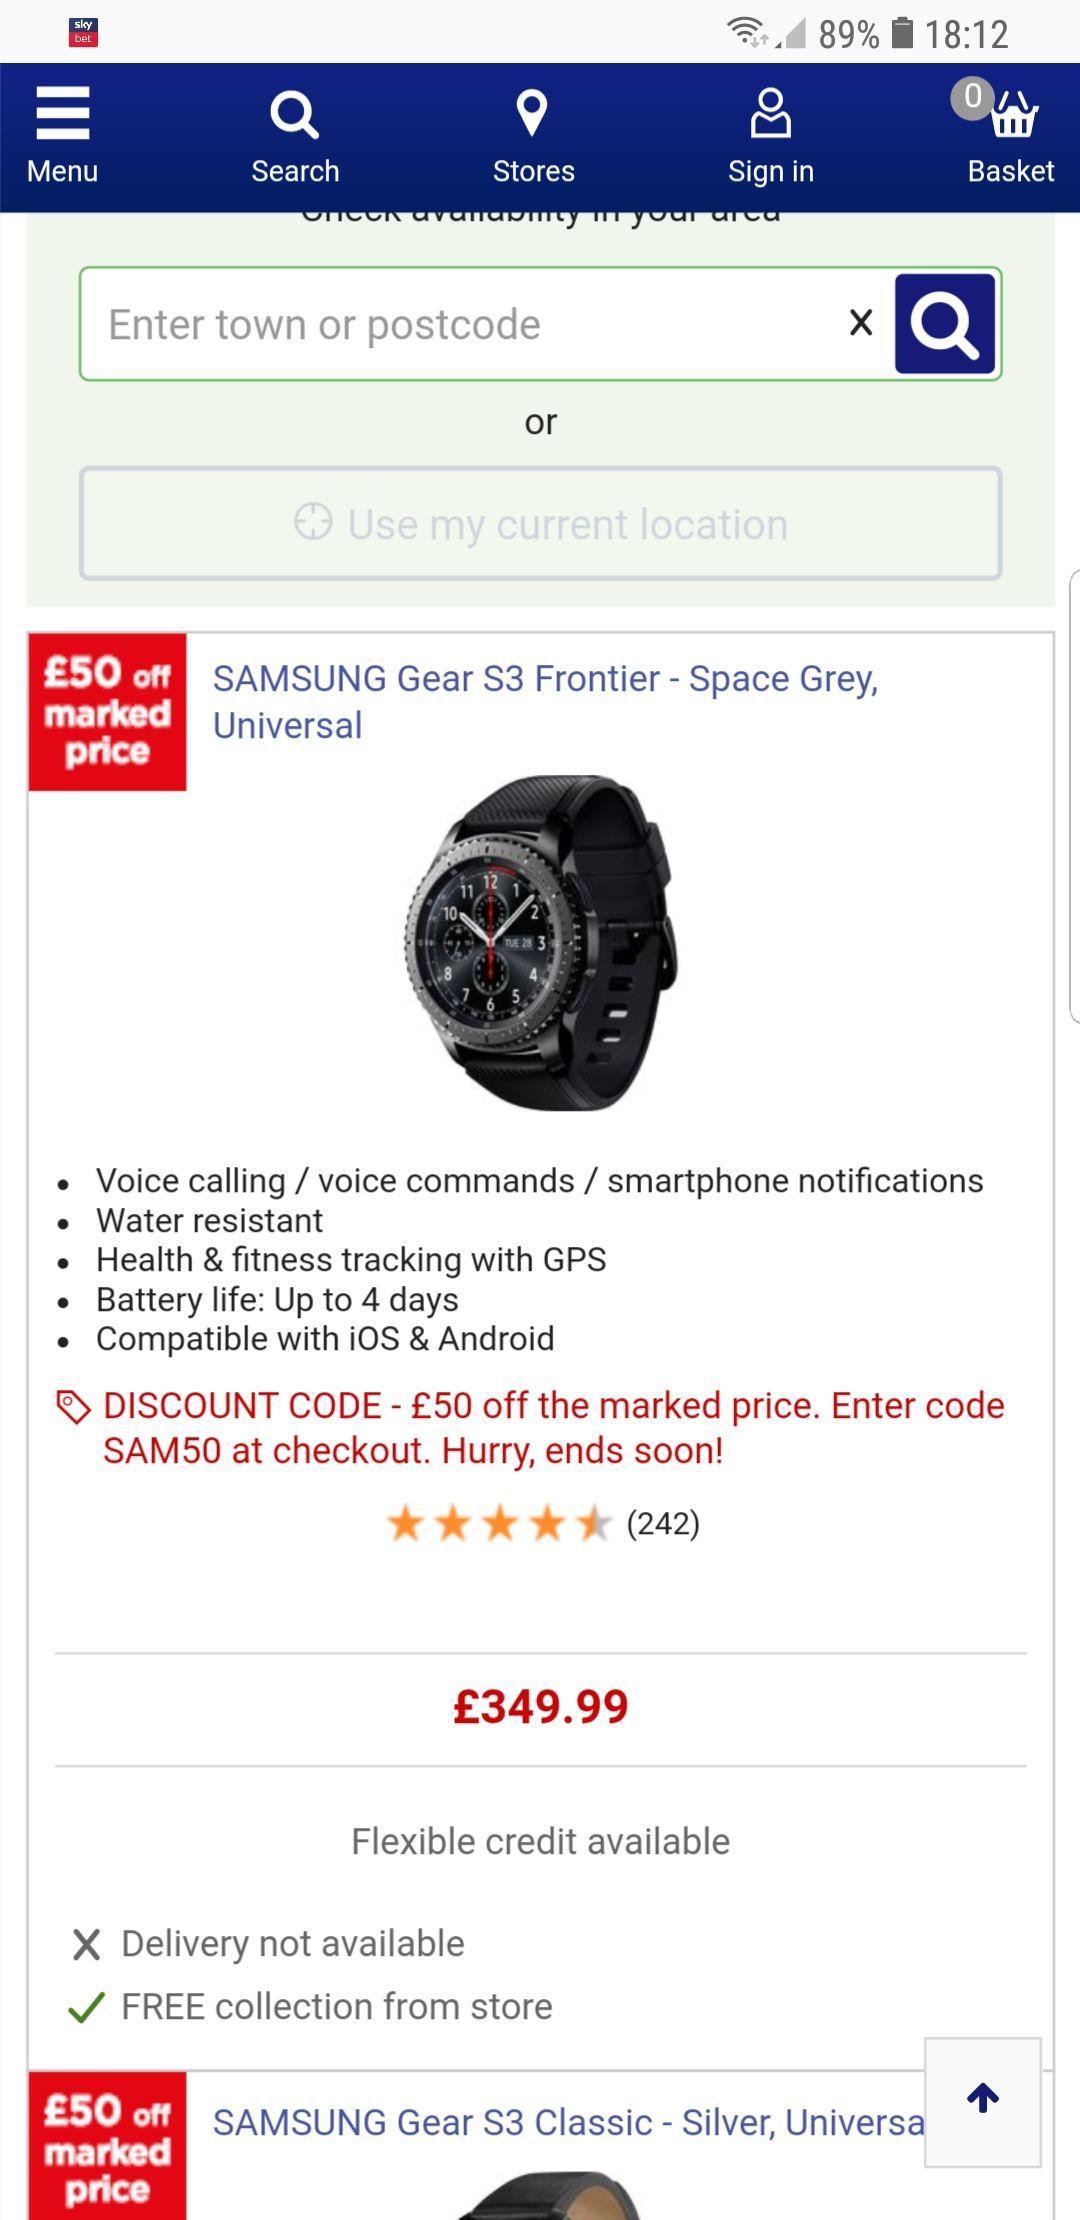 Samsung gear s3 £50 off £299.99 @ Currys